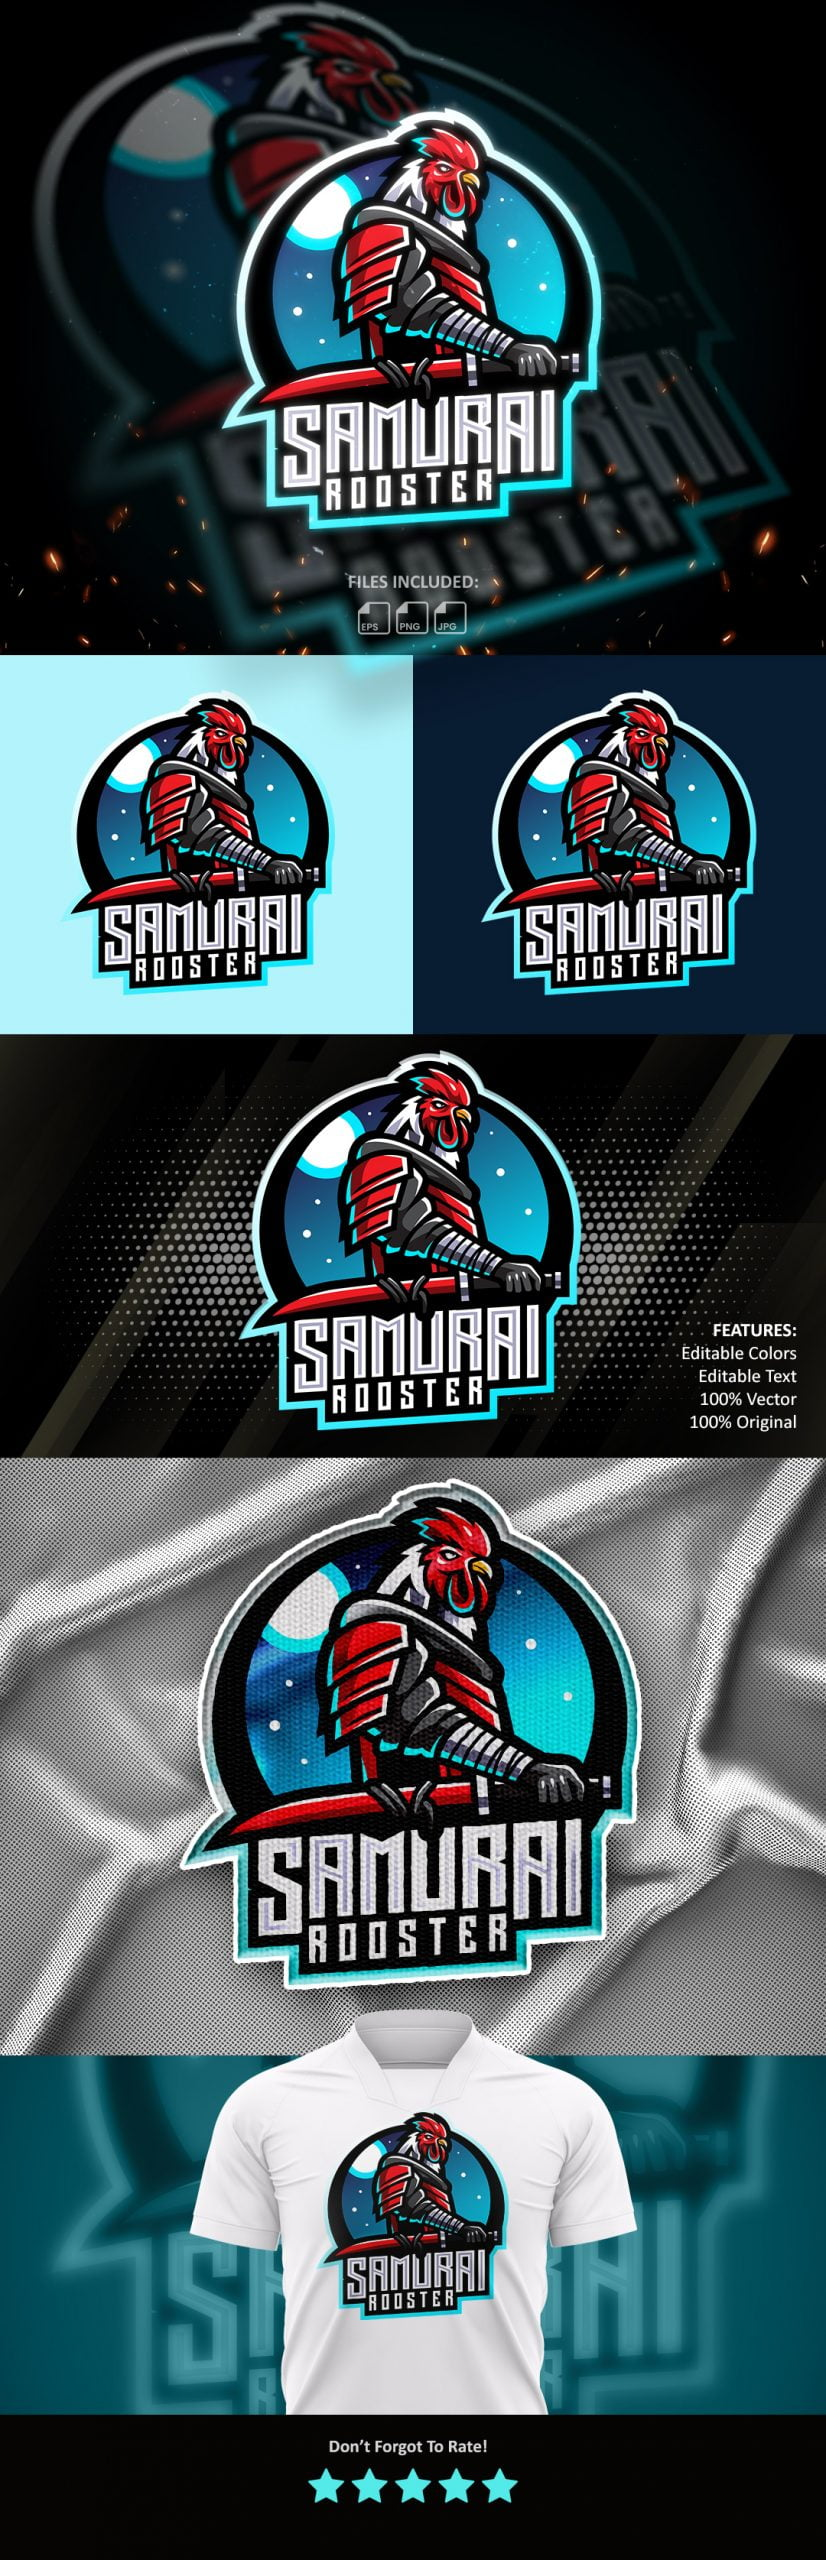 Free-Samurai-Rooster-Esports-Mascot-Logo-Template